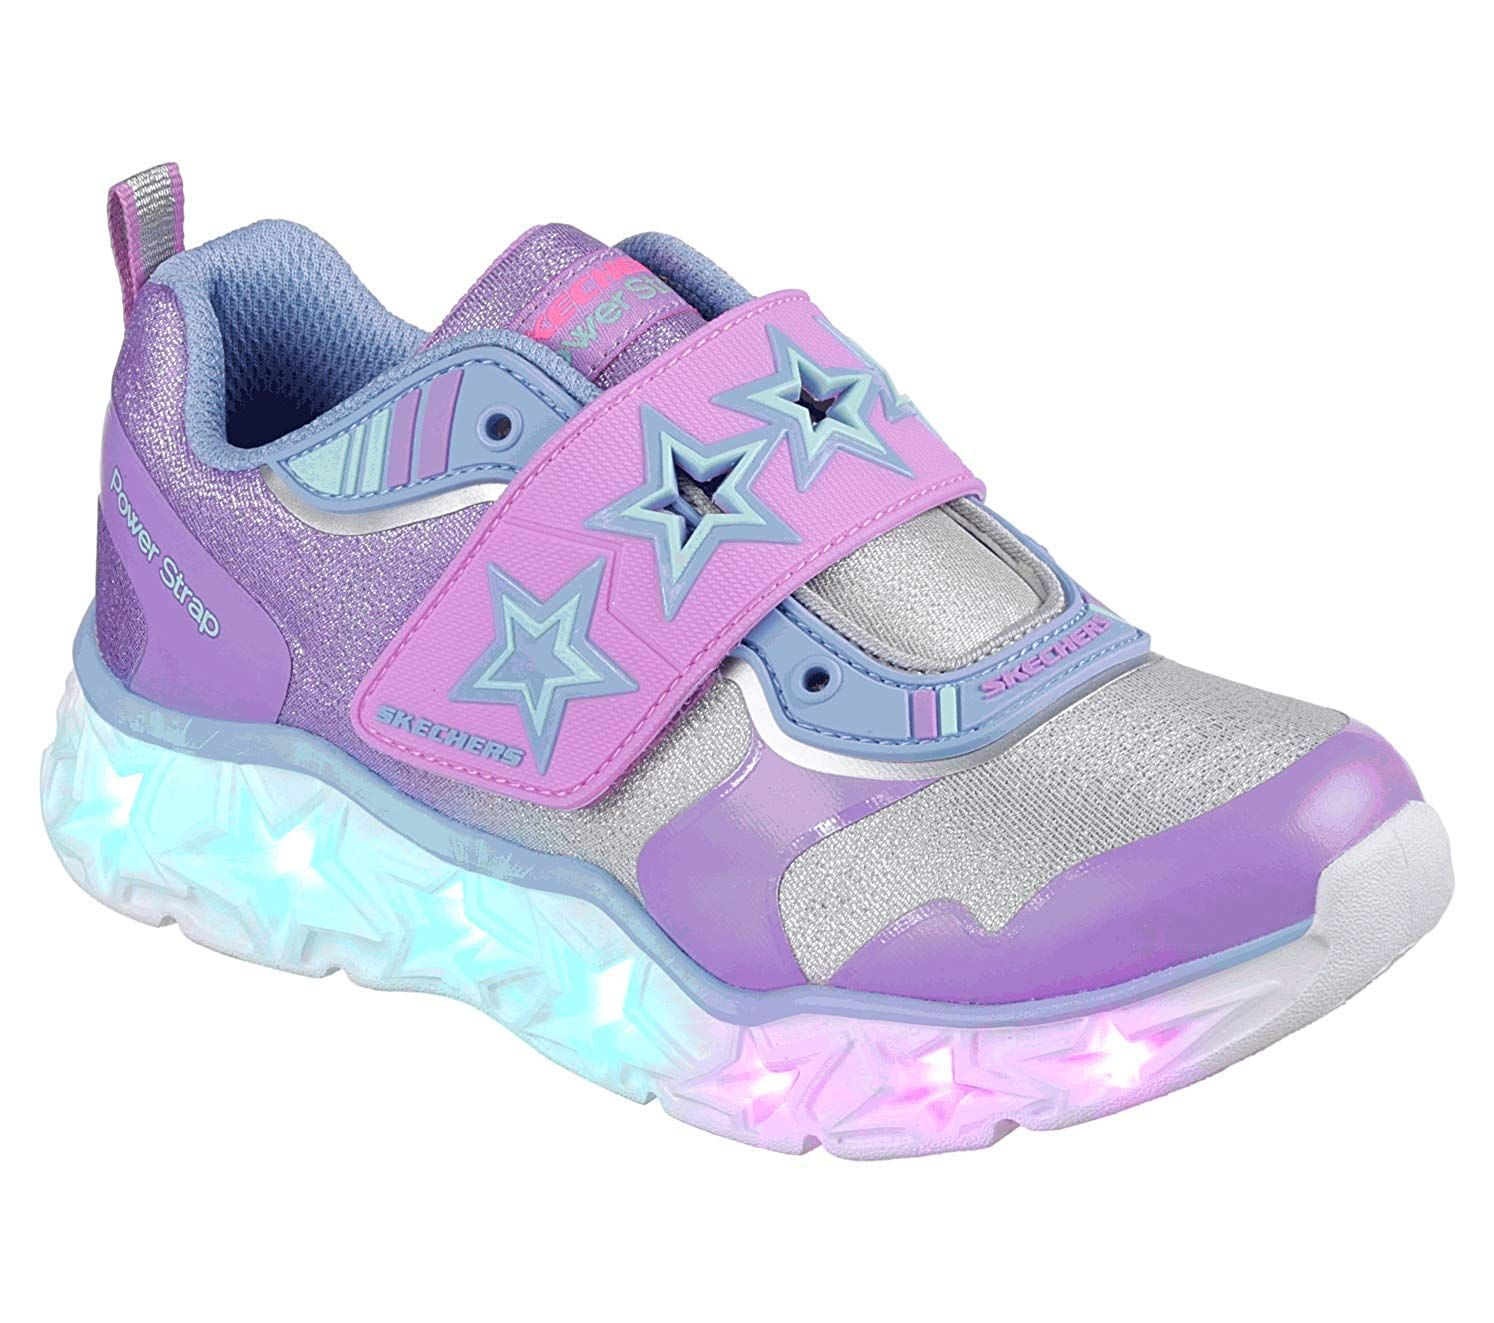 Skechers Kids Girls' Glimmer Kicks Sneaker, PinkMulti, 1 Medium US Little Kid